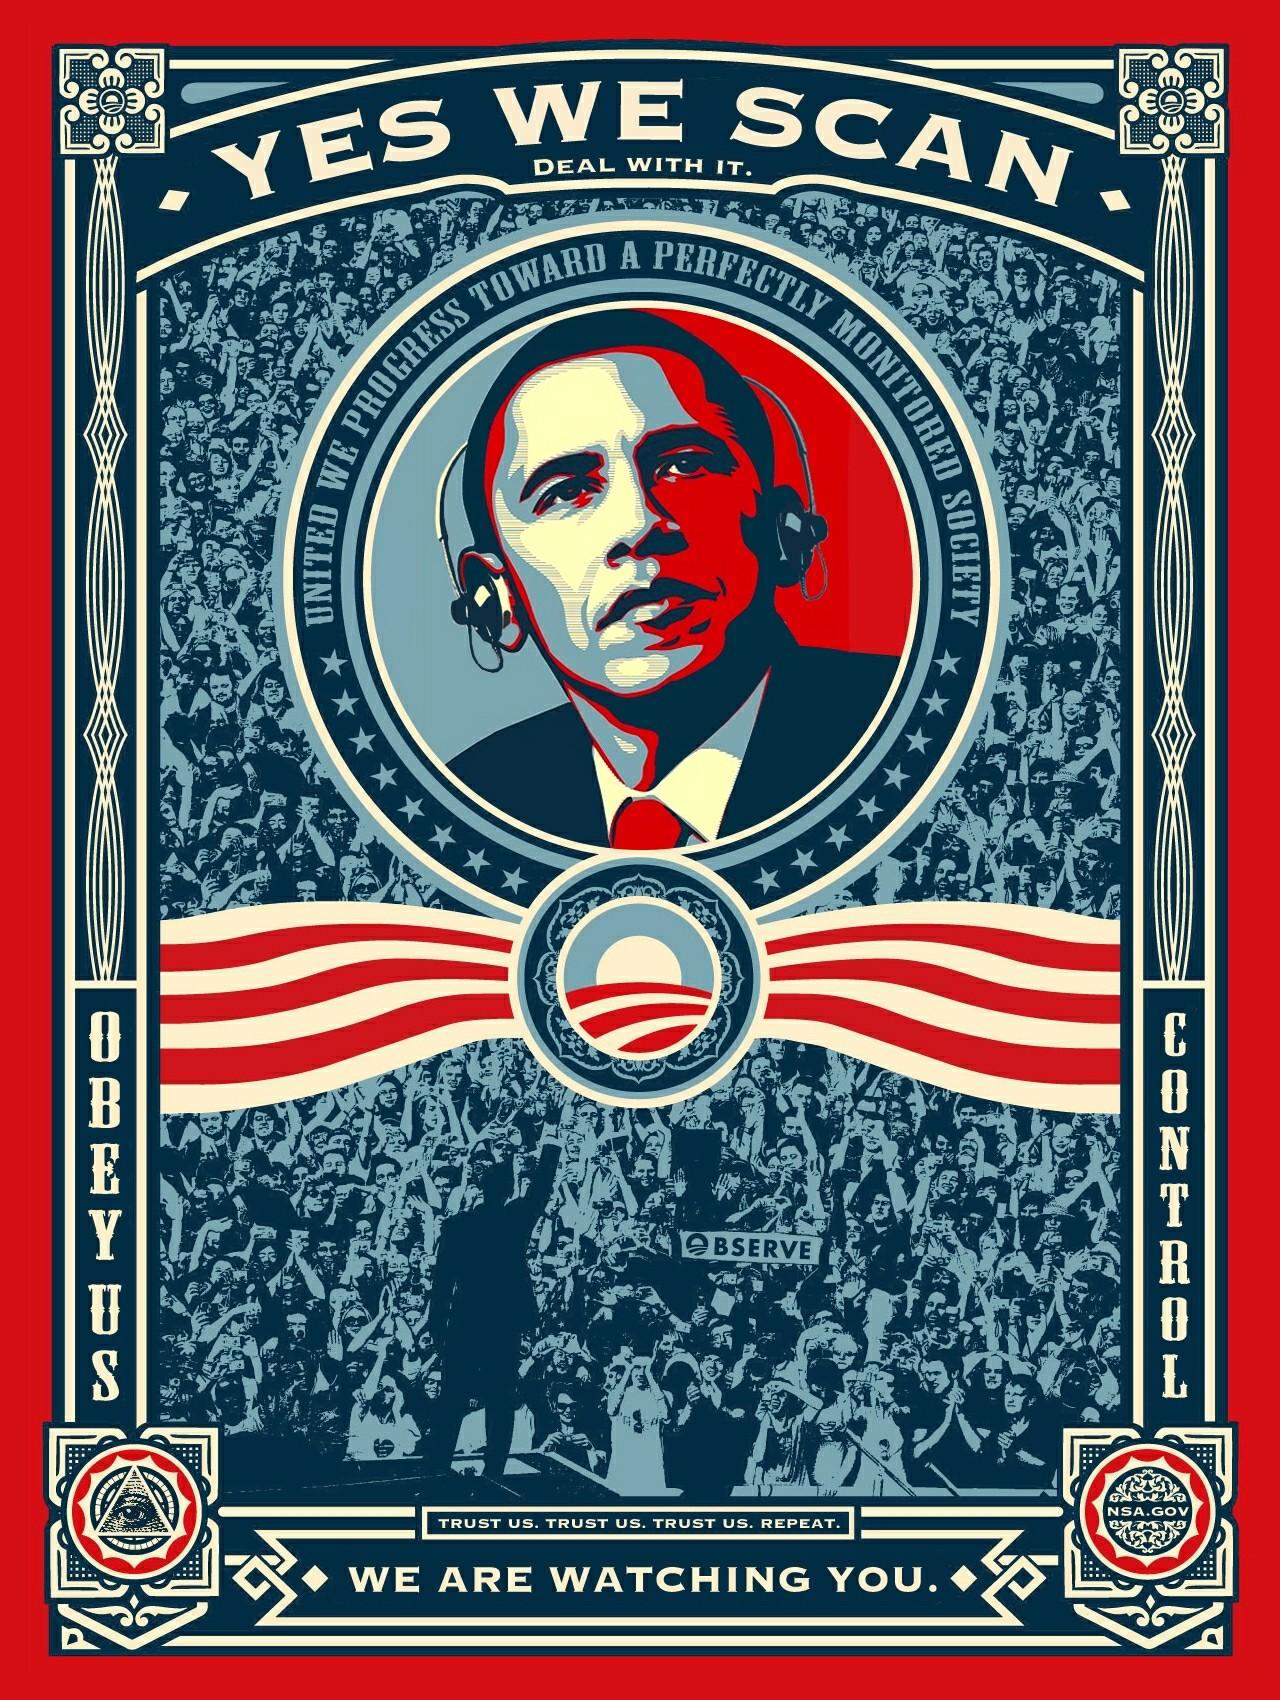 Obama is listening